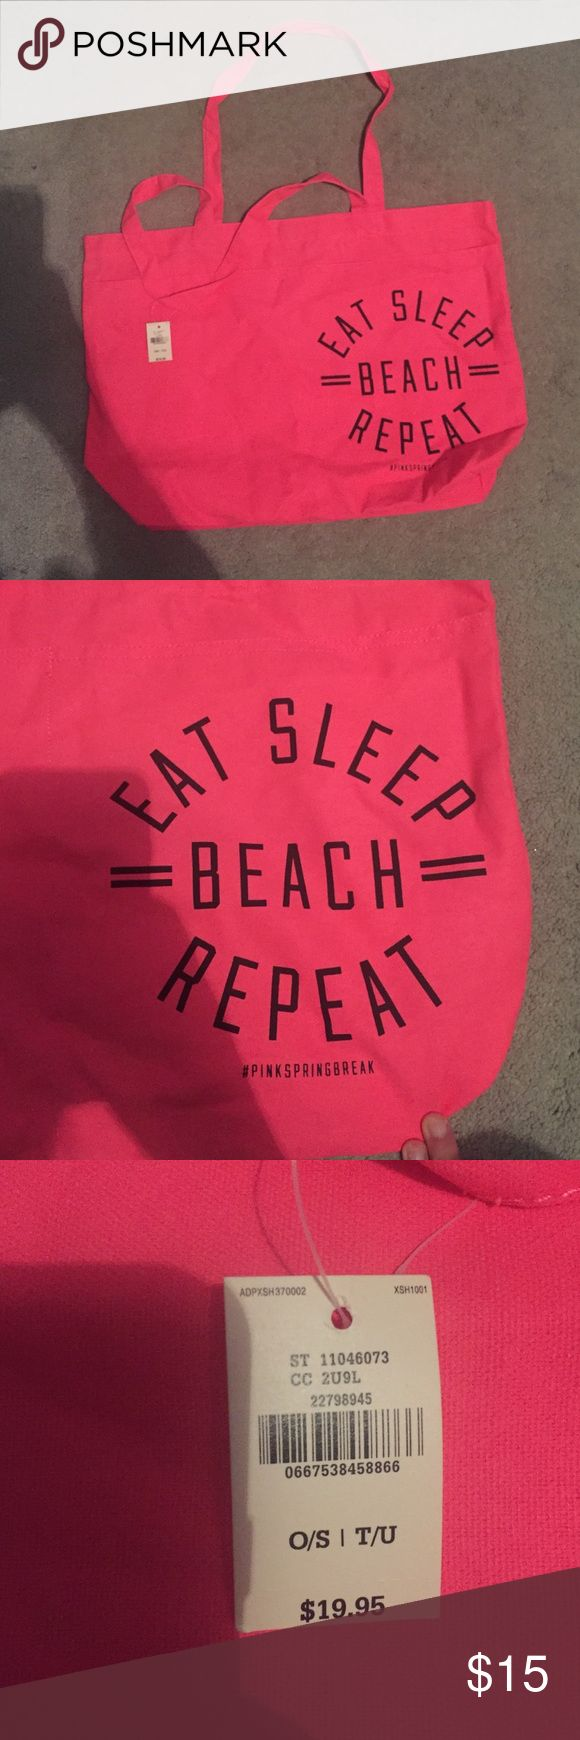 Bright pink tote bag Bright pink Victoria's Secret tote bag, never used with tags PINK Victoria's Secret Bags Totes